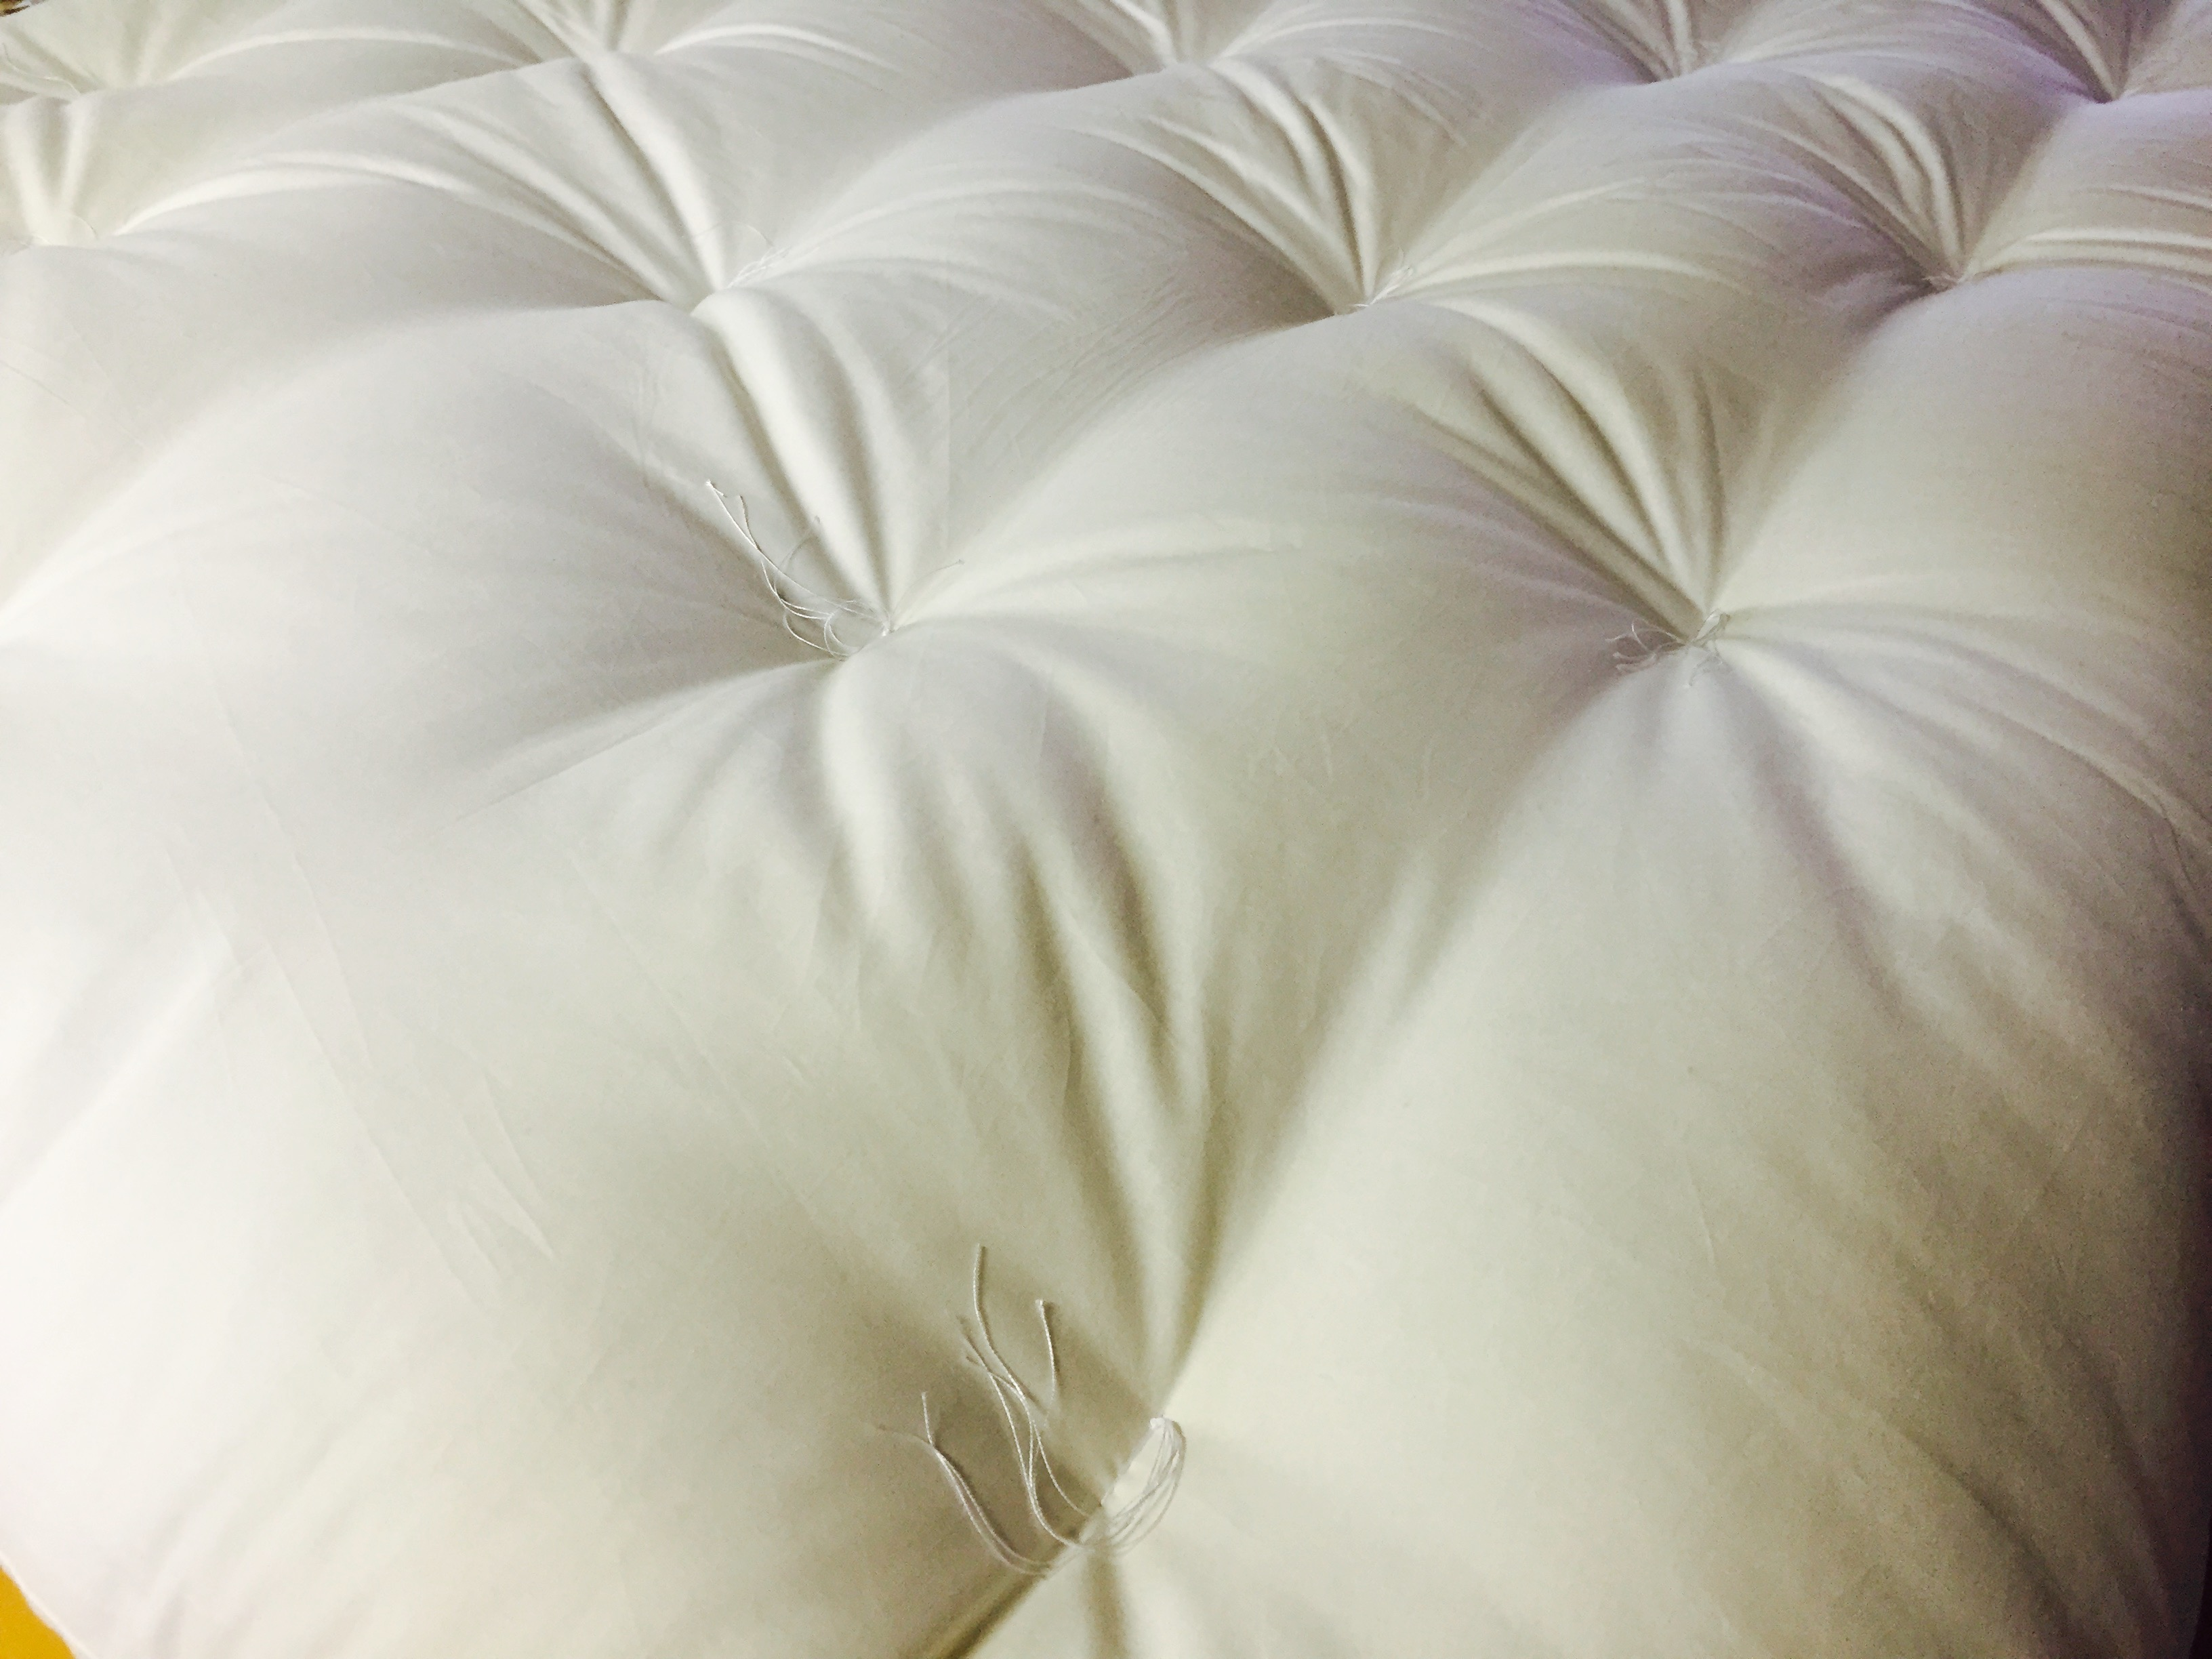 Shikibuton futon plain white image